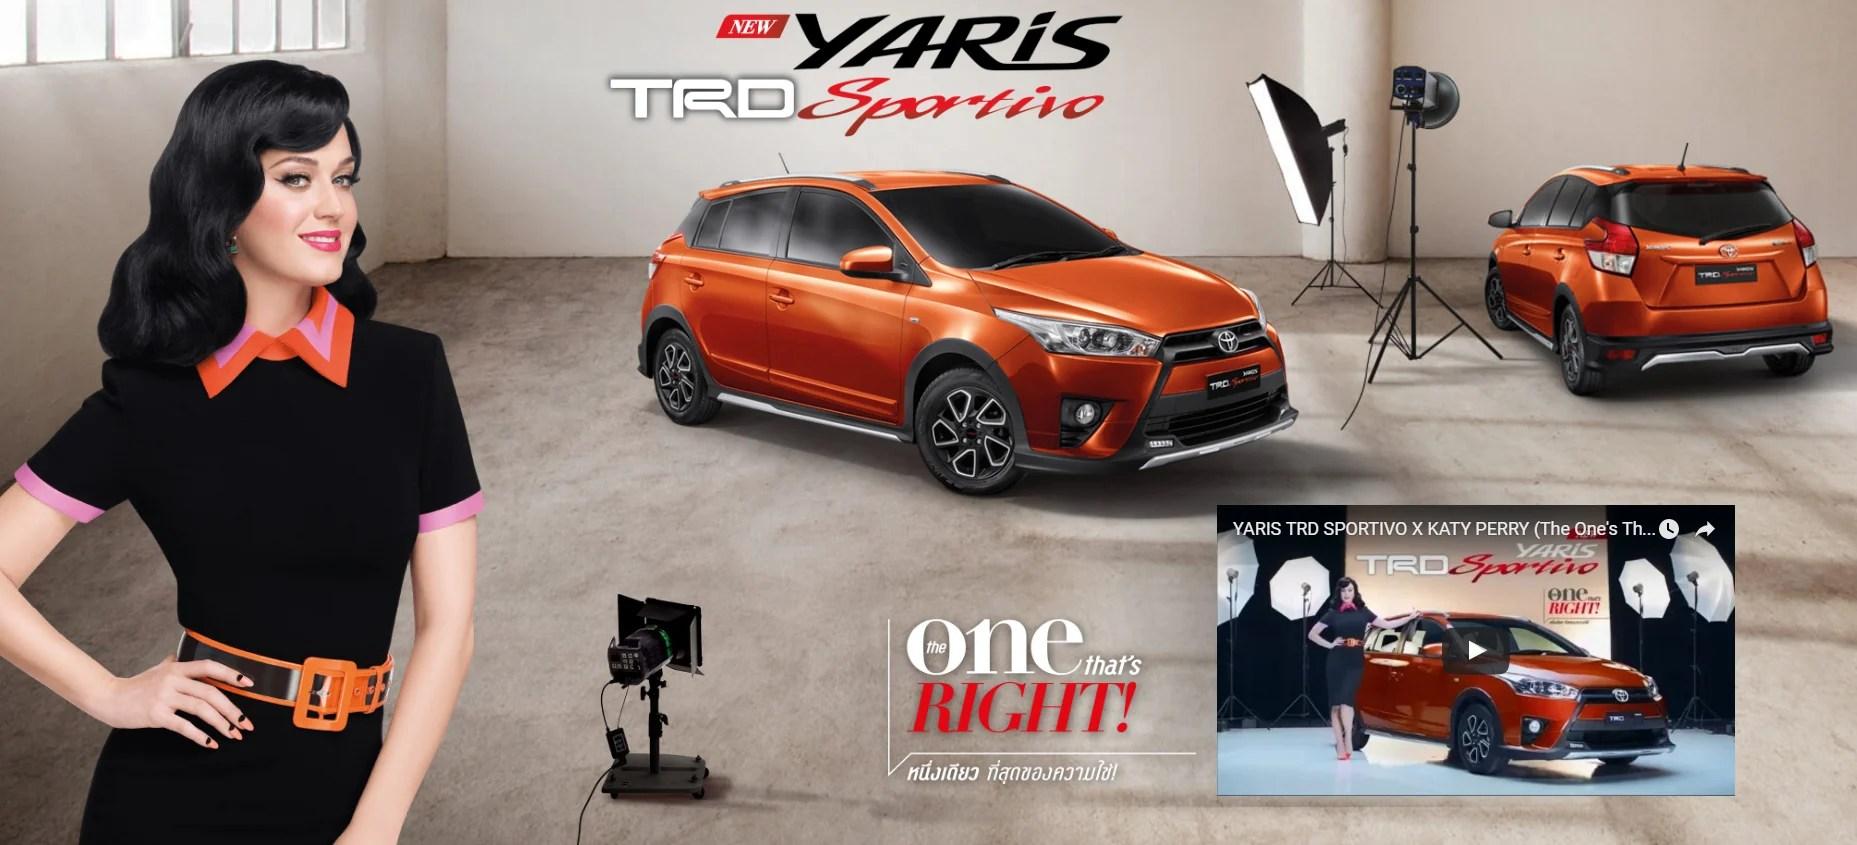 toyota yaris trd sportivo 2014 velg grand new avanza 2015 2016 revealed for thailand paul